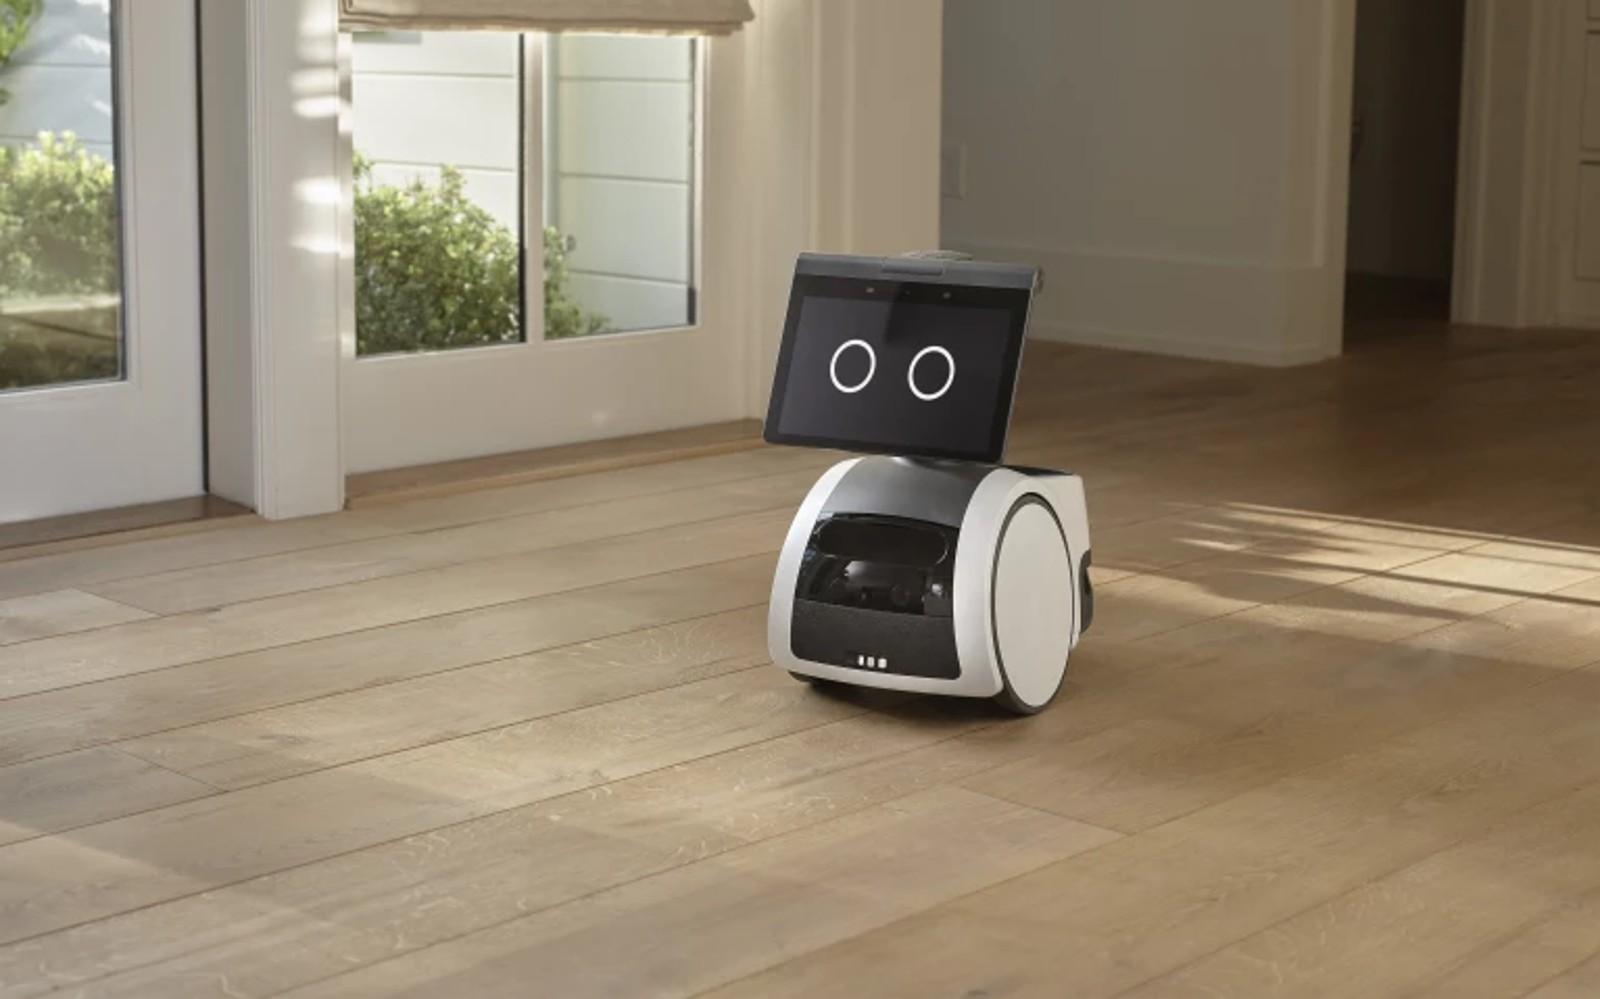 Amazon Astro is an Alexa robot that roams your home | Engadget